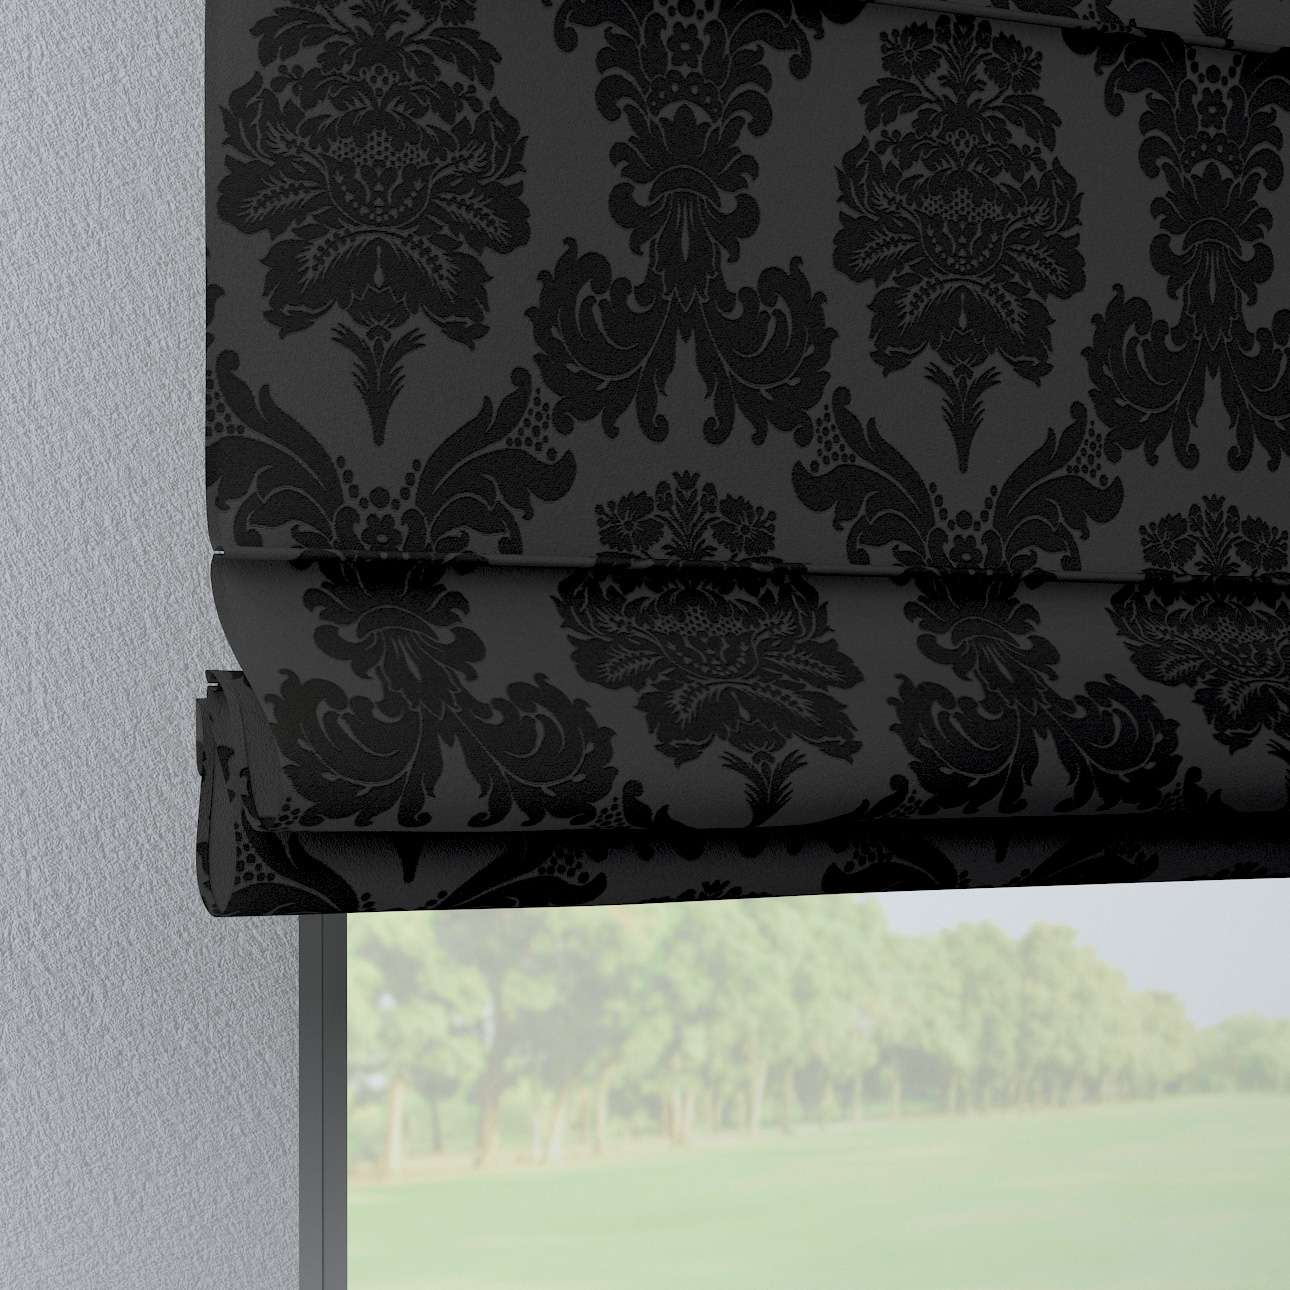 Foldegardin Verona<br/>Med stropper til gardinstang 80 x 170 cm fra kollektionen Damasco, Stof: 613-32